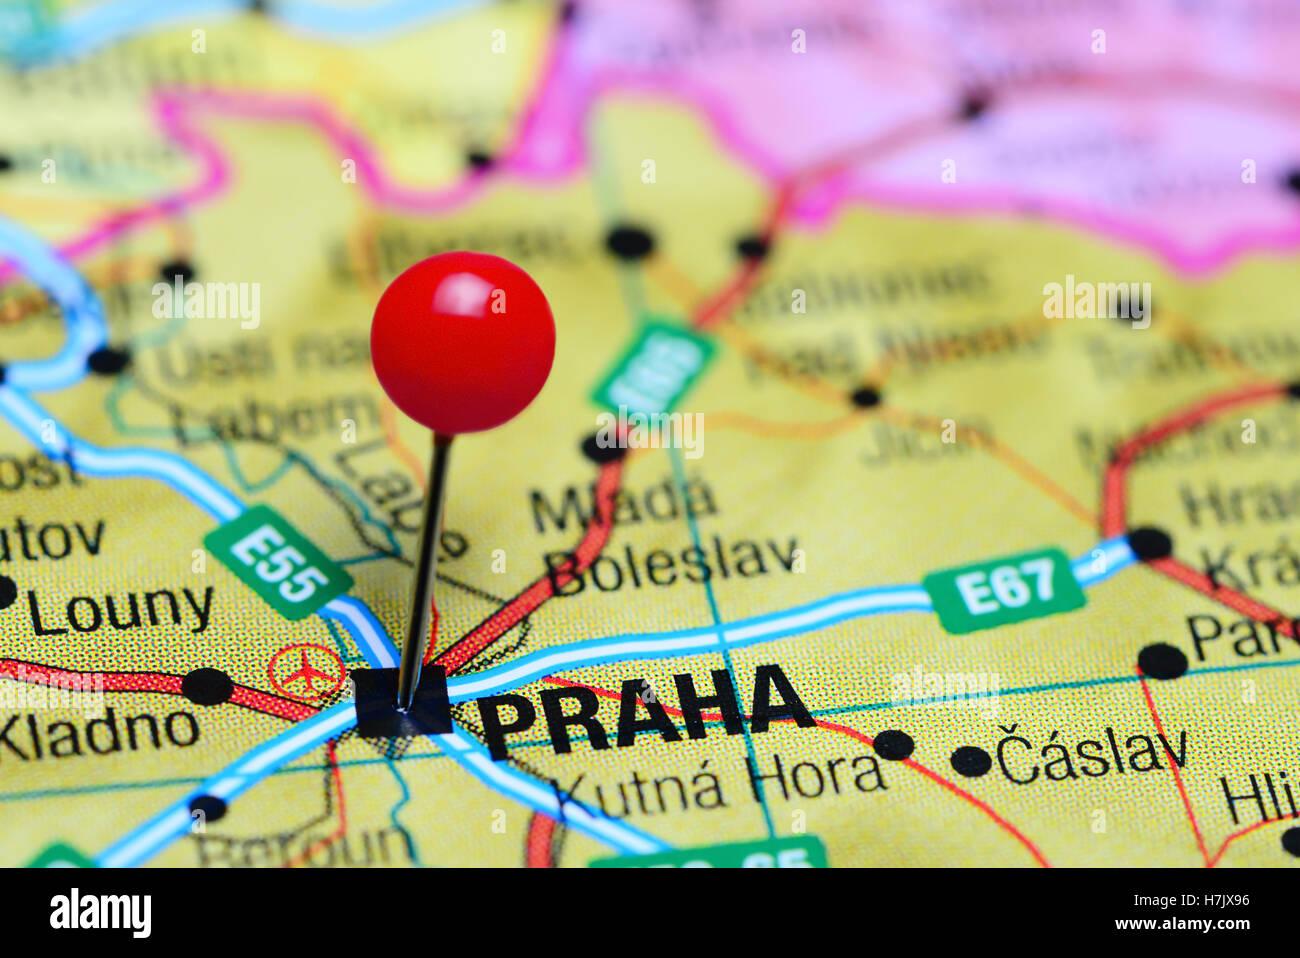 Prague Pinned On Map Europe Stock Photos & Prague Pinned On Map ...